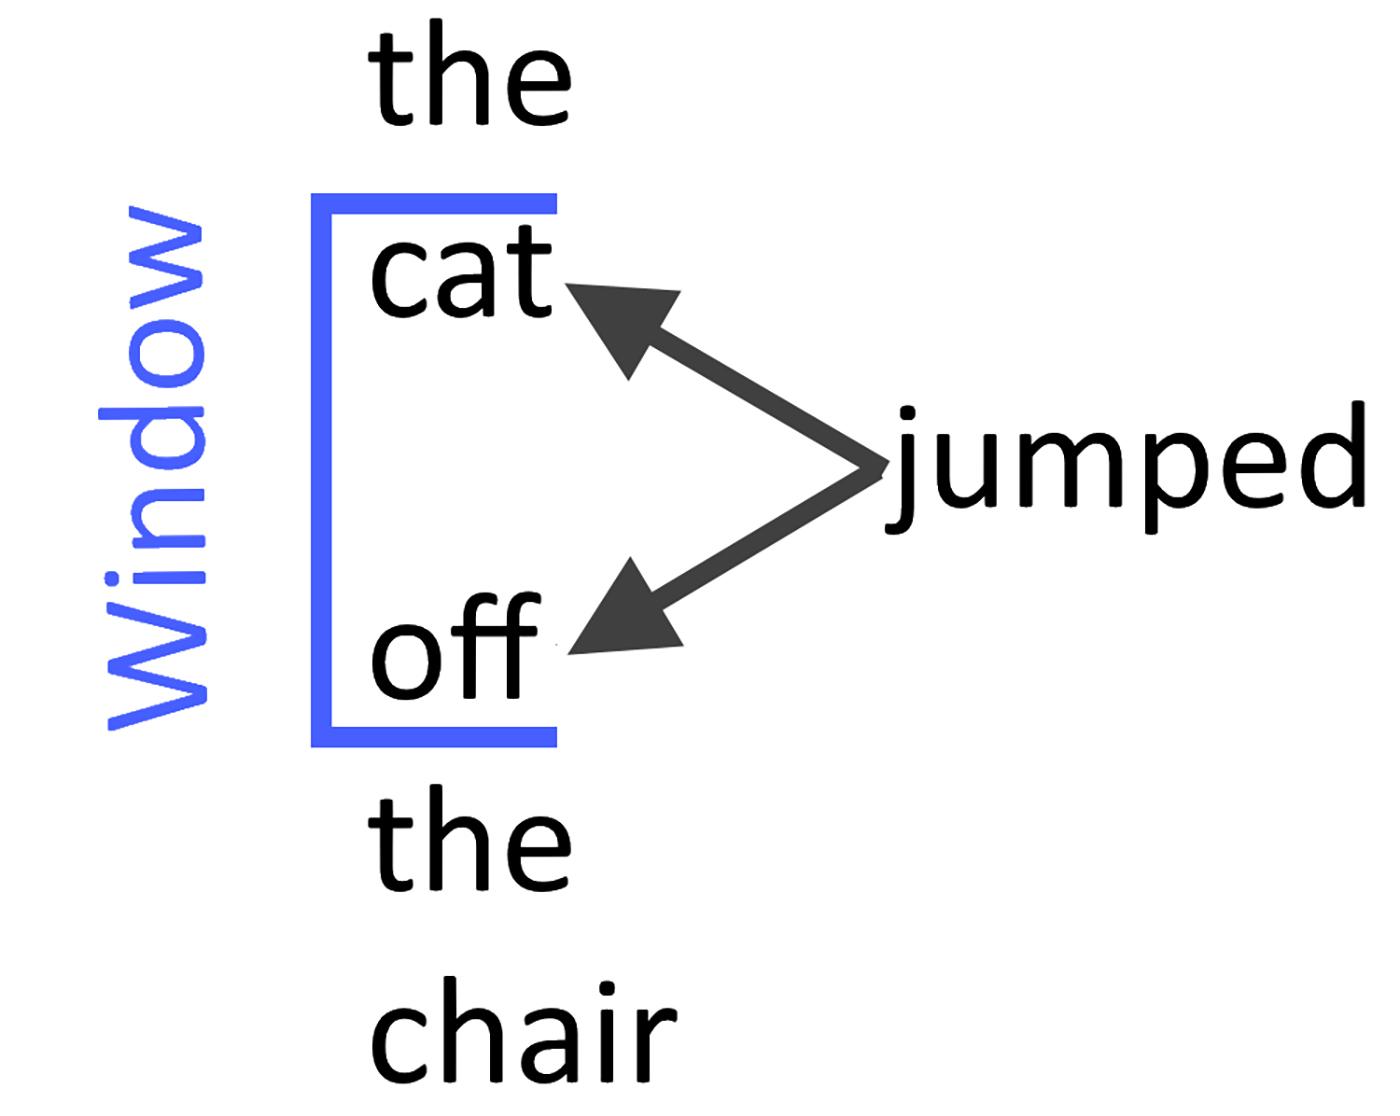 Predicting the context given a word